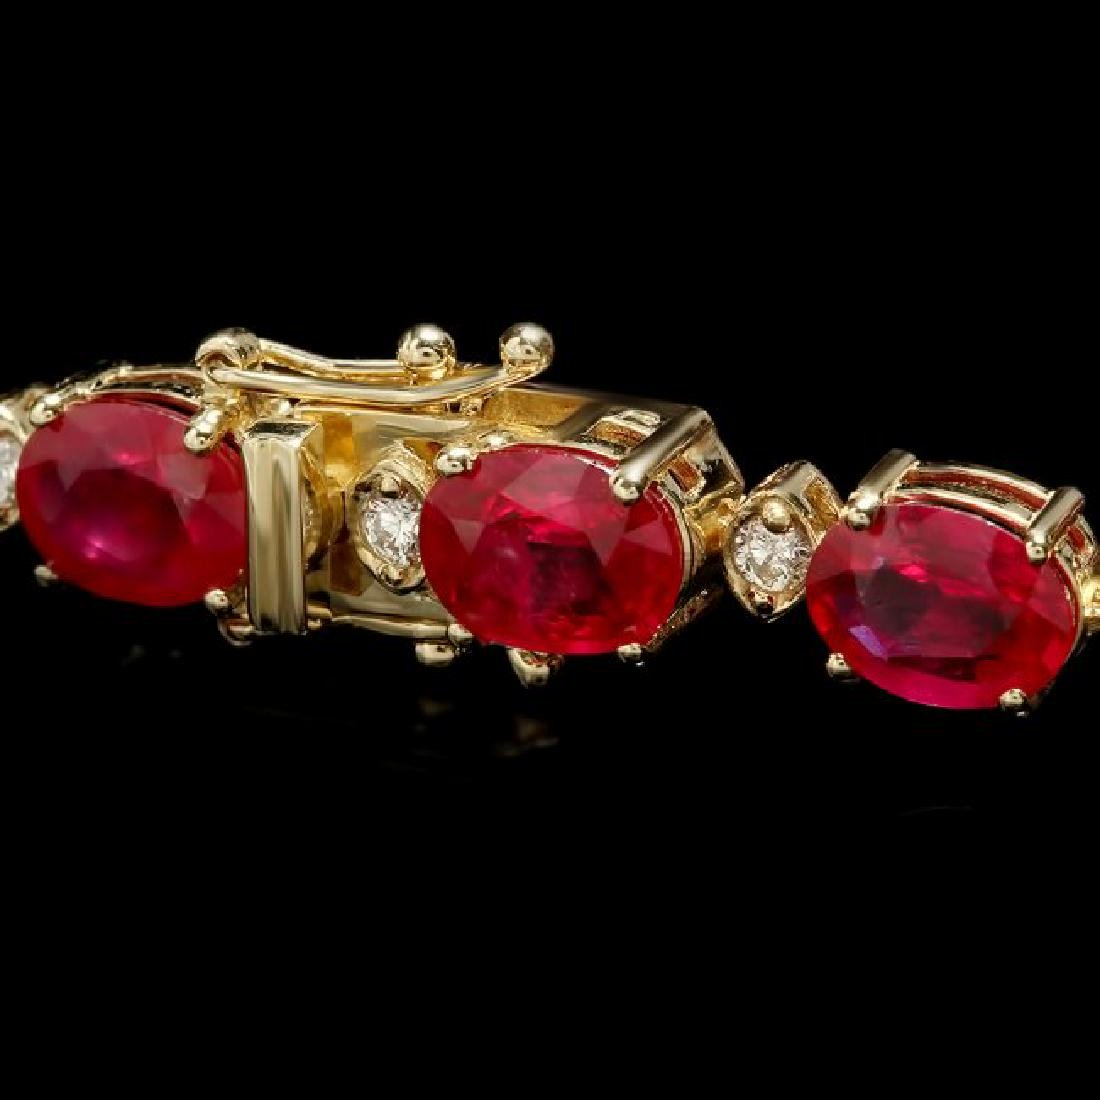 14k Gold 34.50ct Ruby 1.15ct Diamond Bracelet - 3